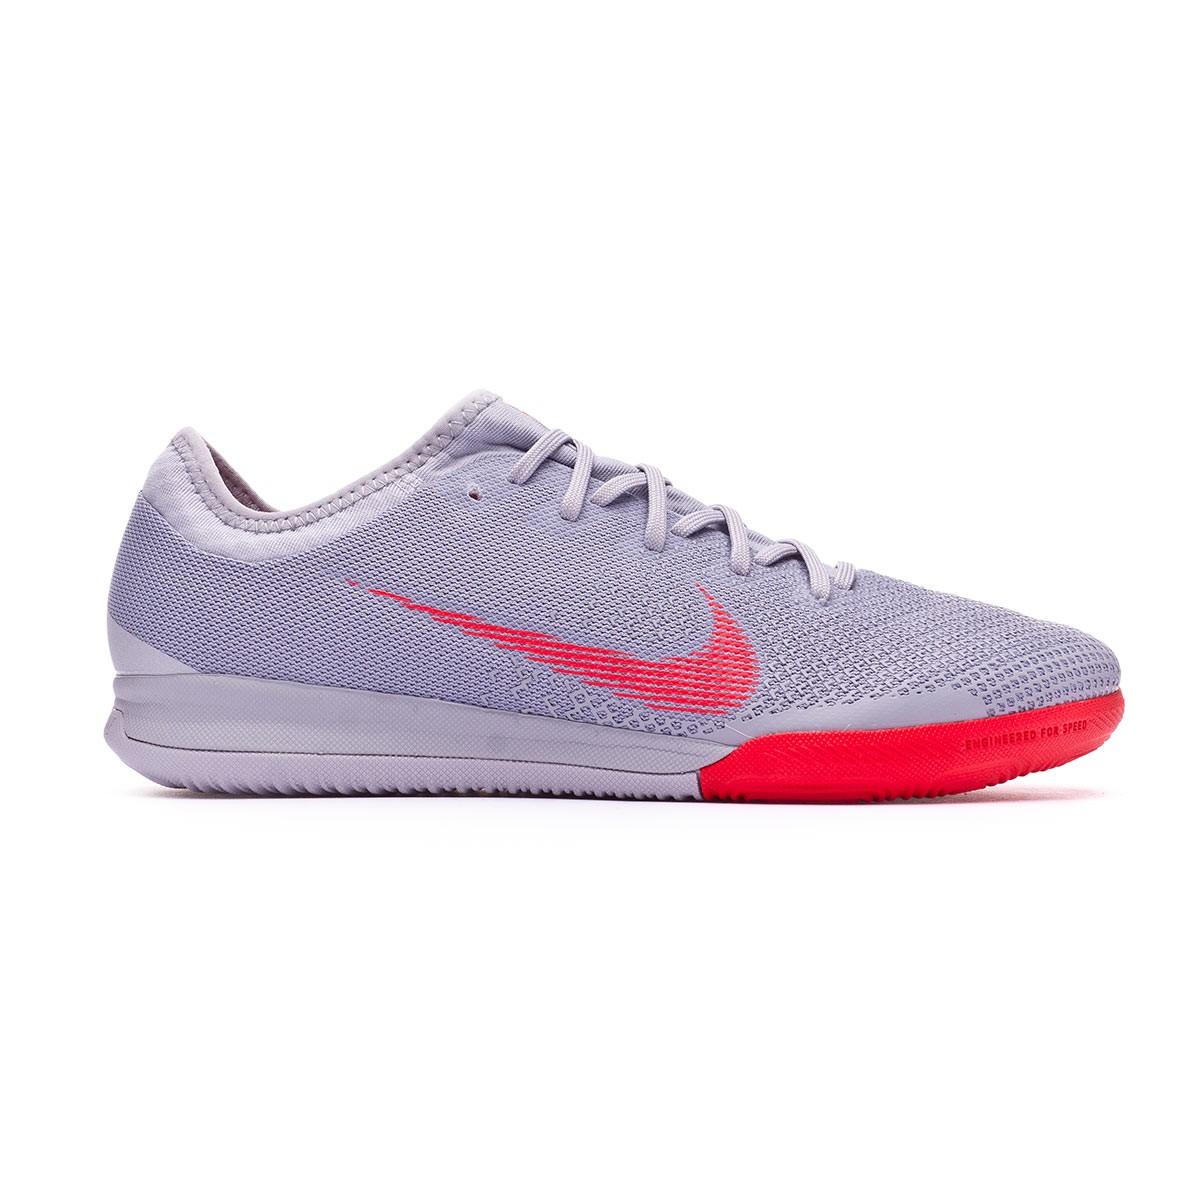 3b17e5d83 Futsal Boot Nike Mercurial VaporX XII Pro IC Wolf grey-Bright crimson-Pure  platinum - Football store Fútbol Emotion